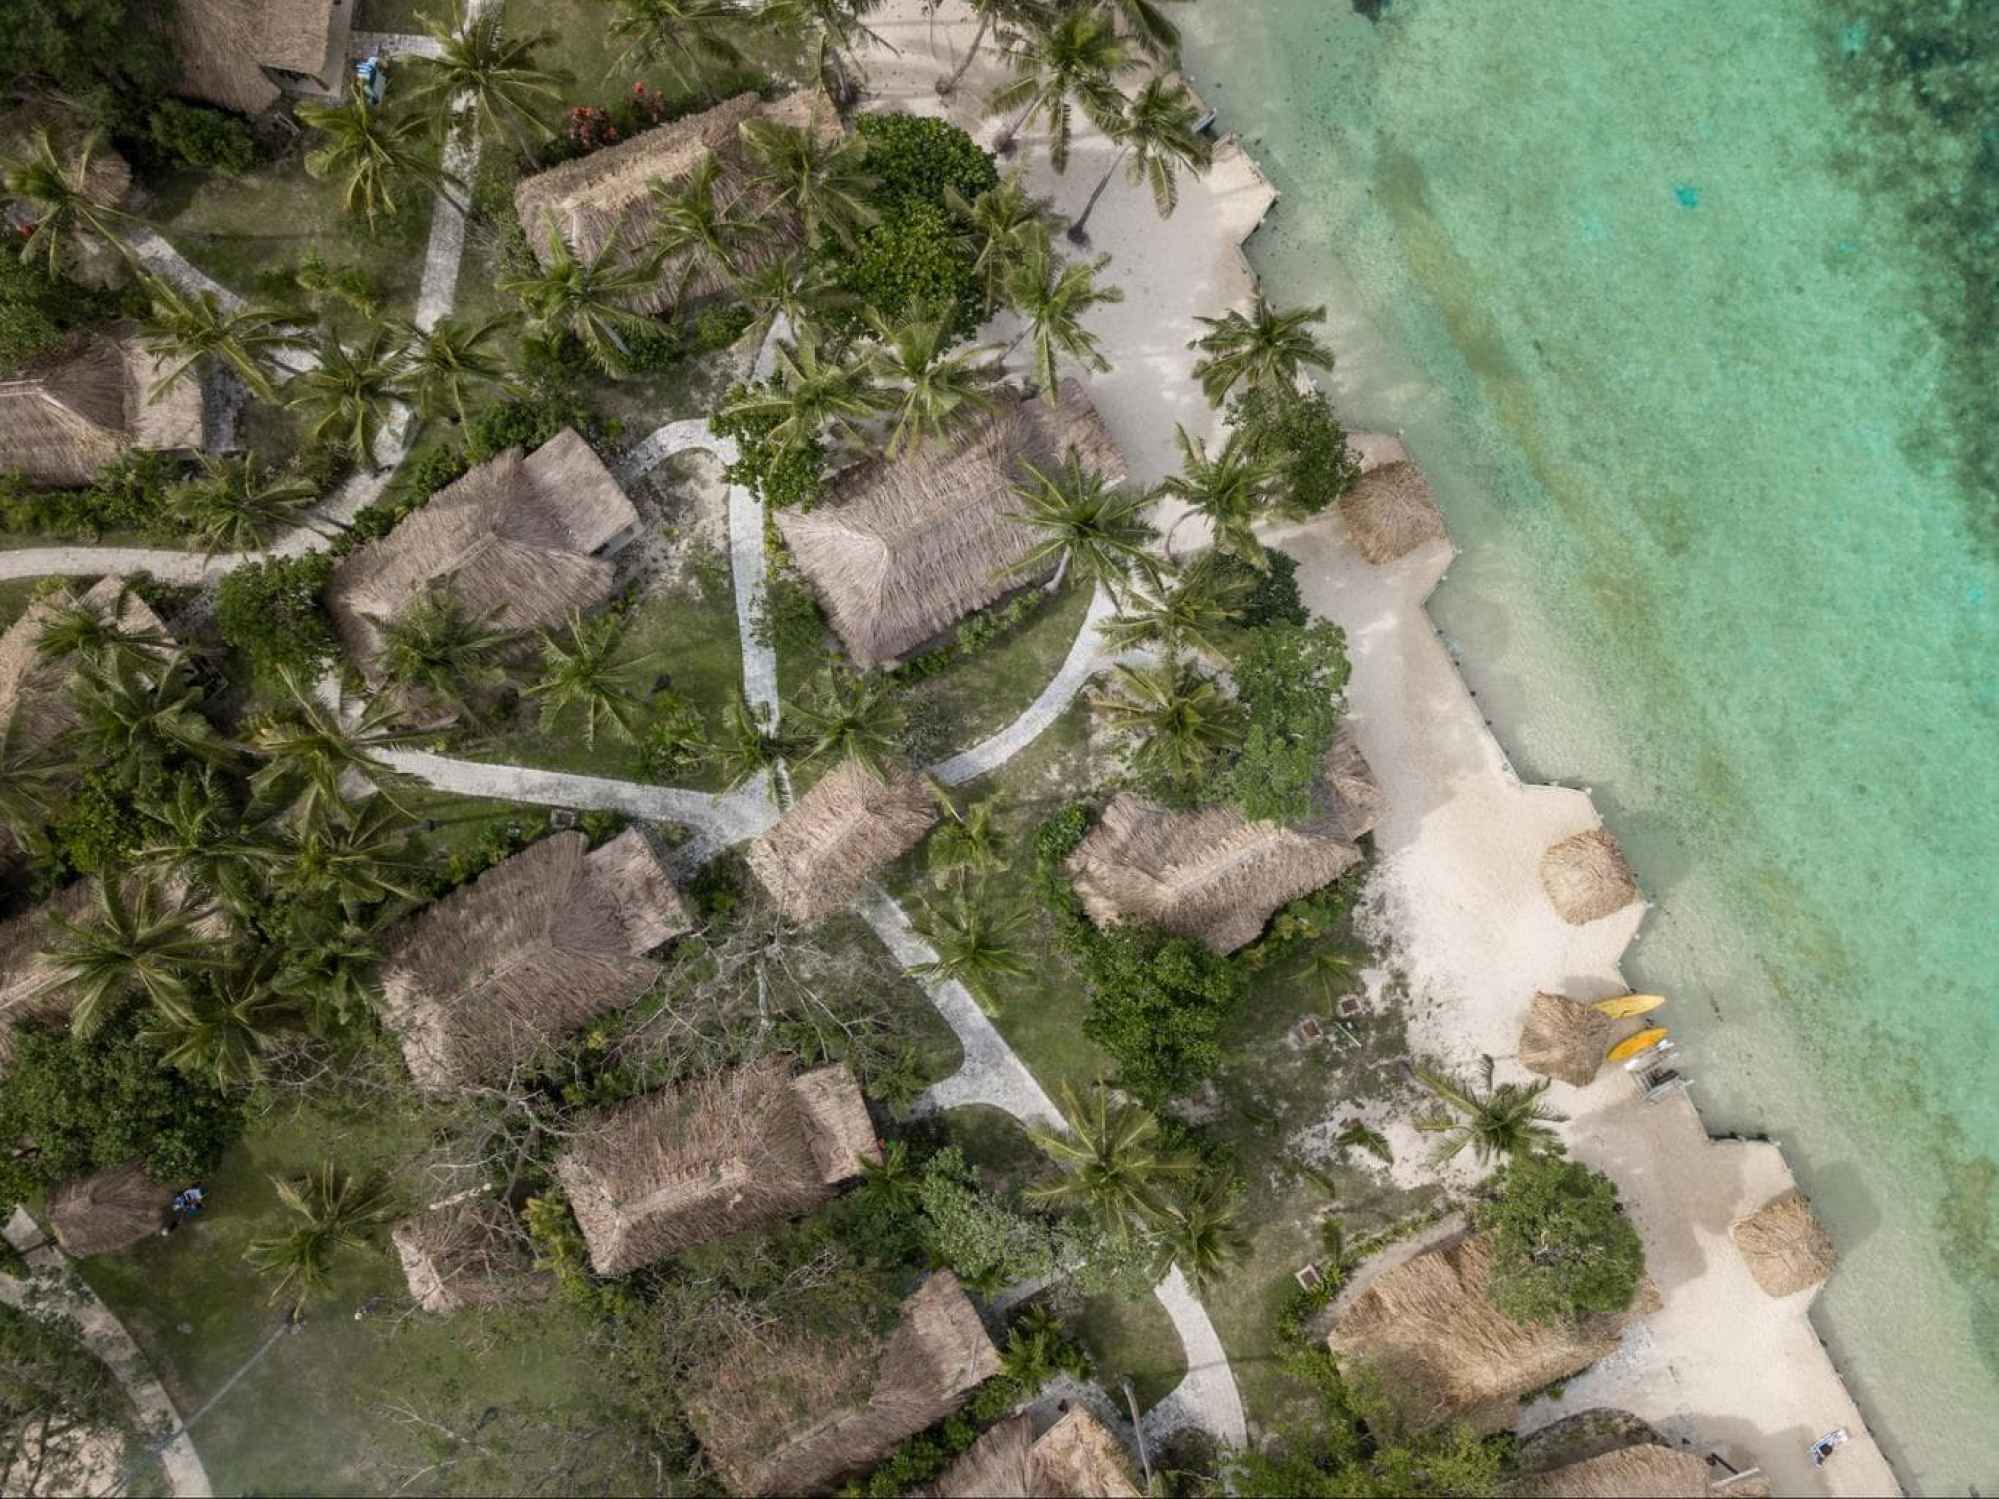 The beach bures at Castaway Island